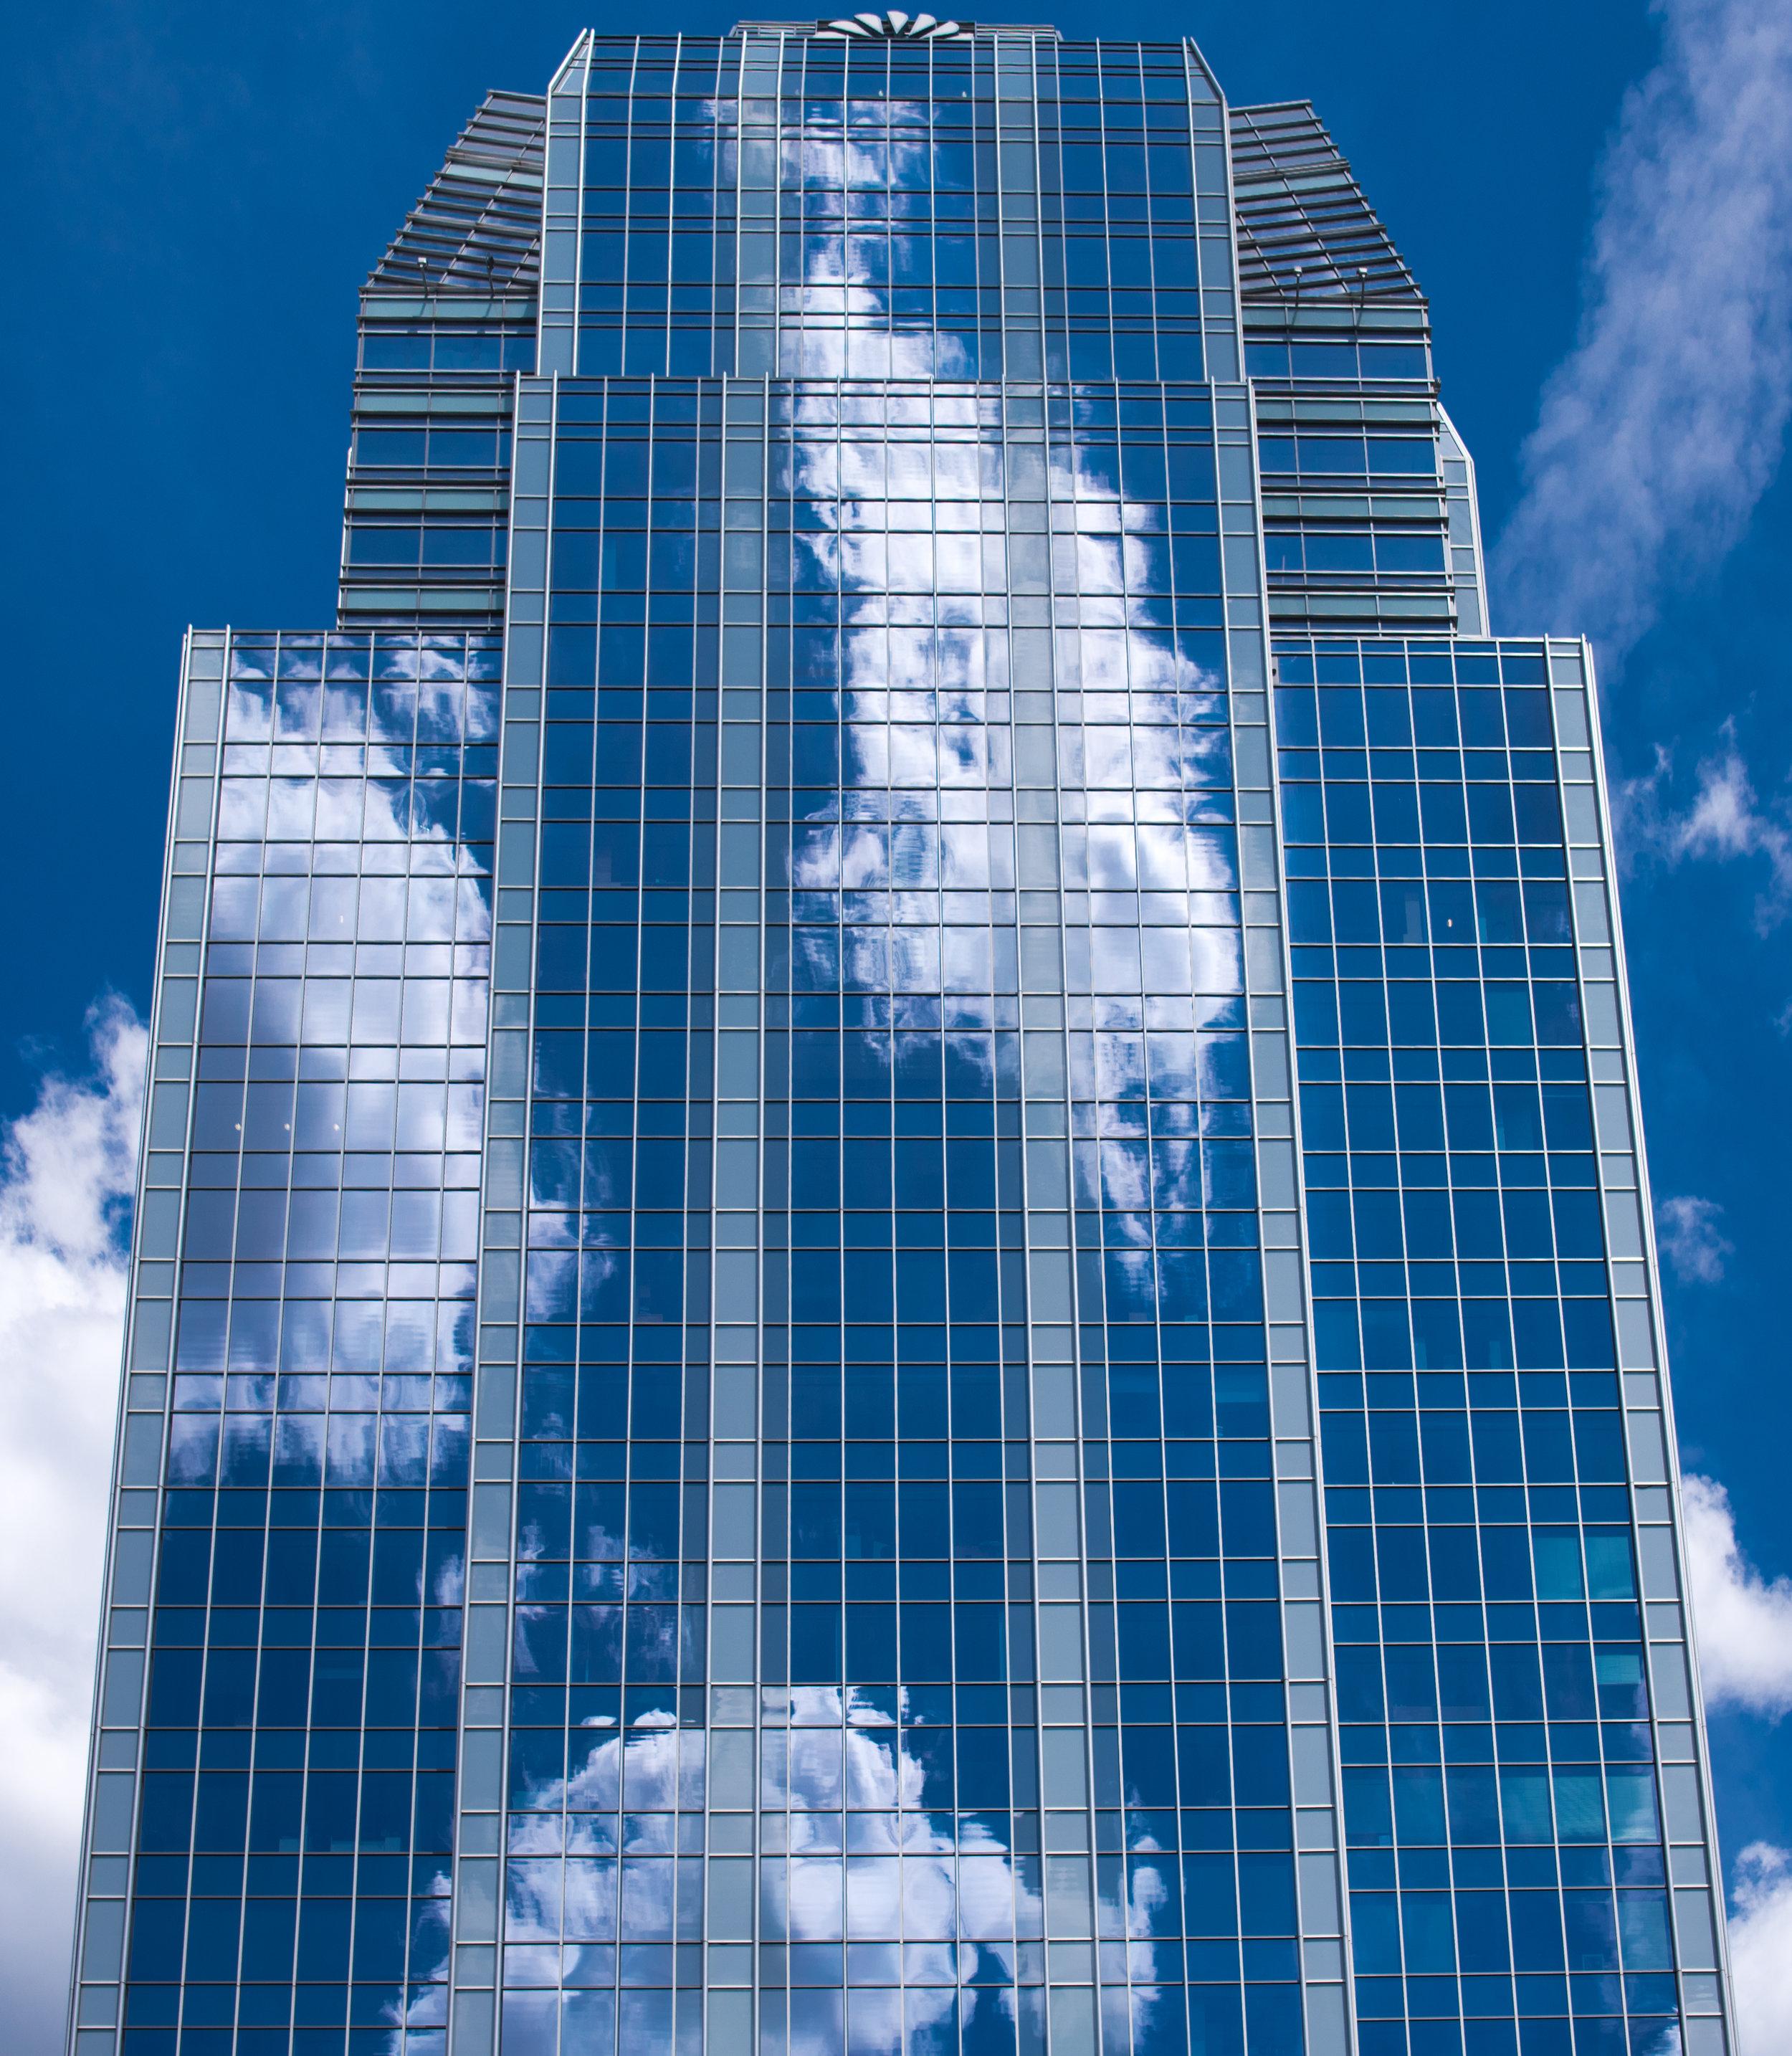 cloudbuilding1 (1 of 1) copy.jpg